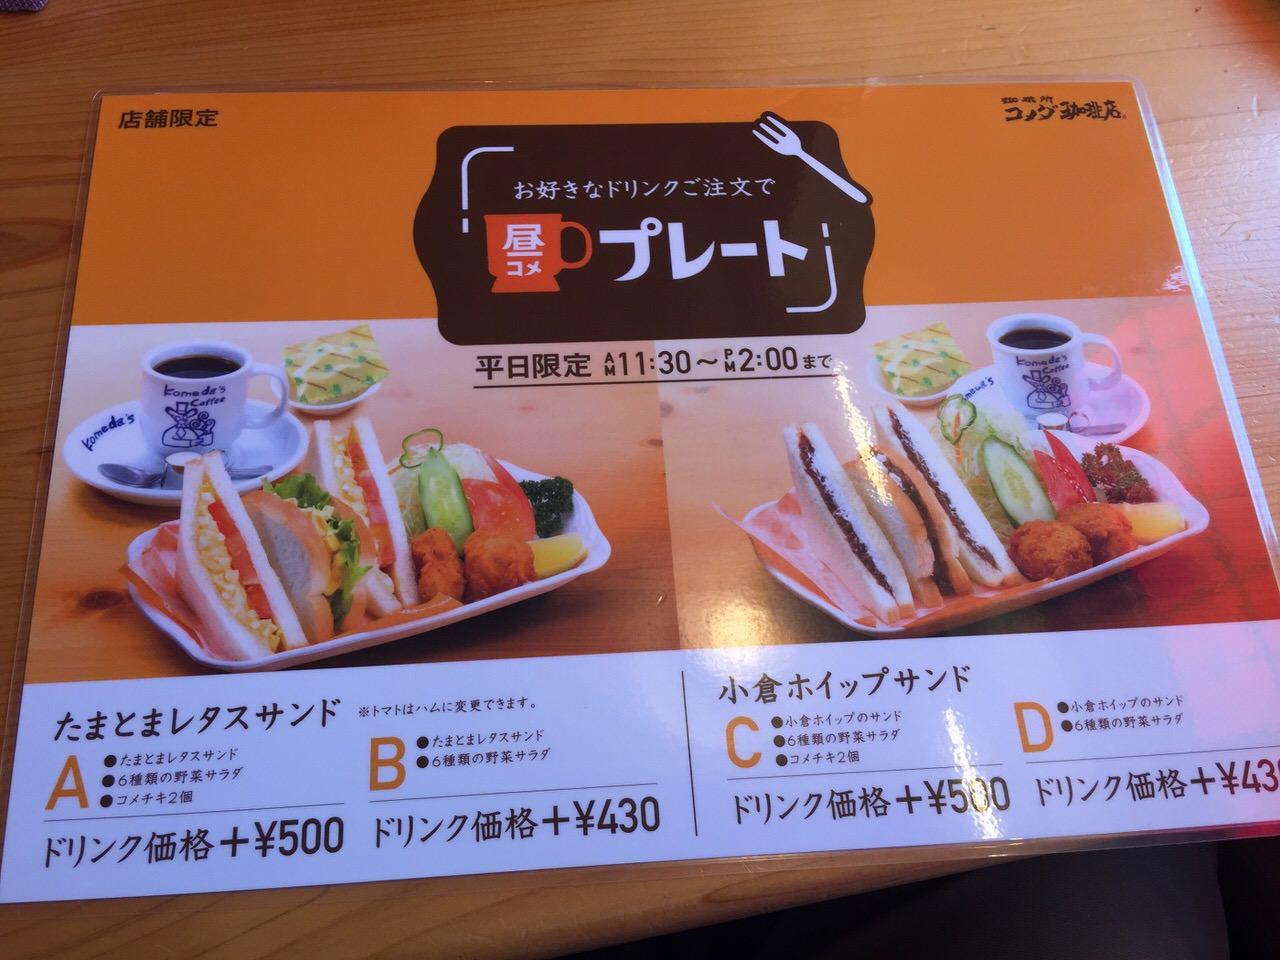 Komeda coffee 3531